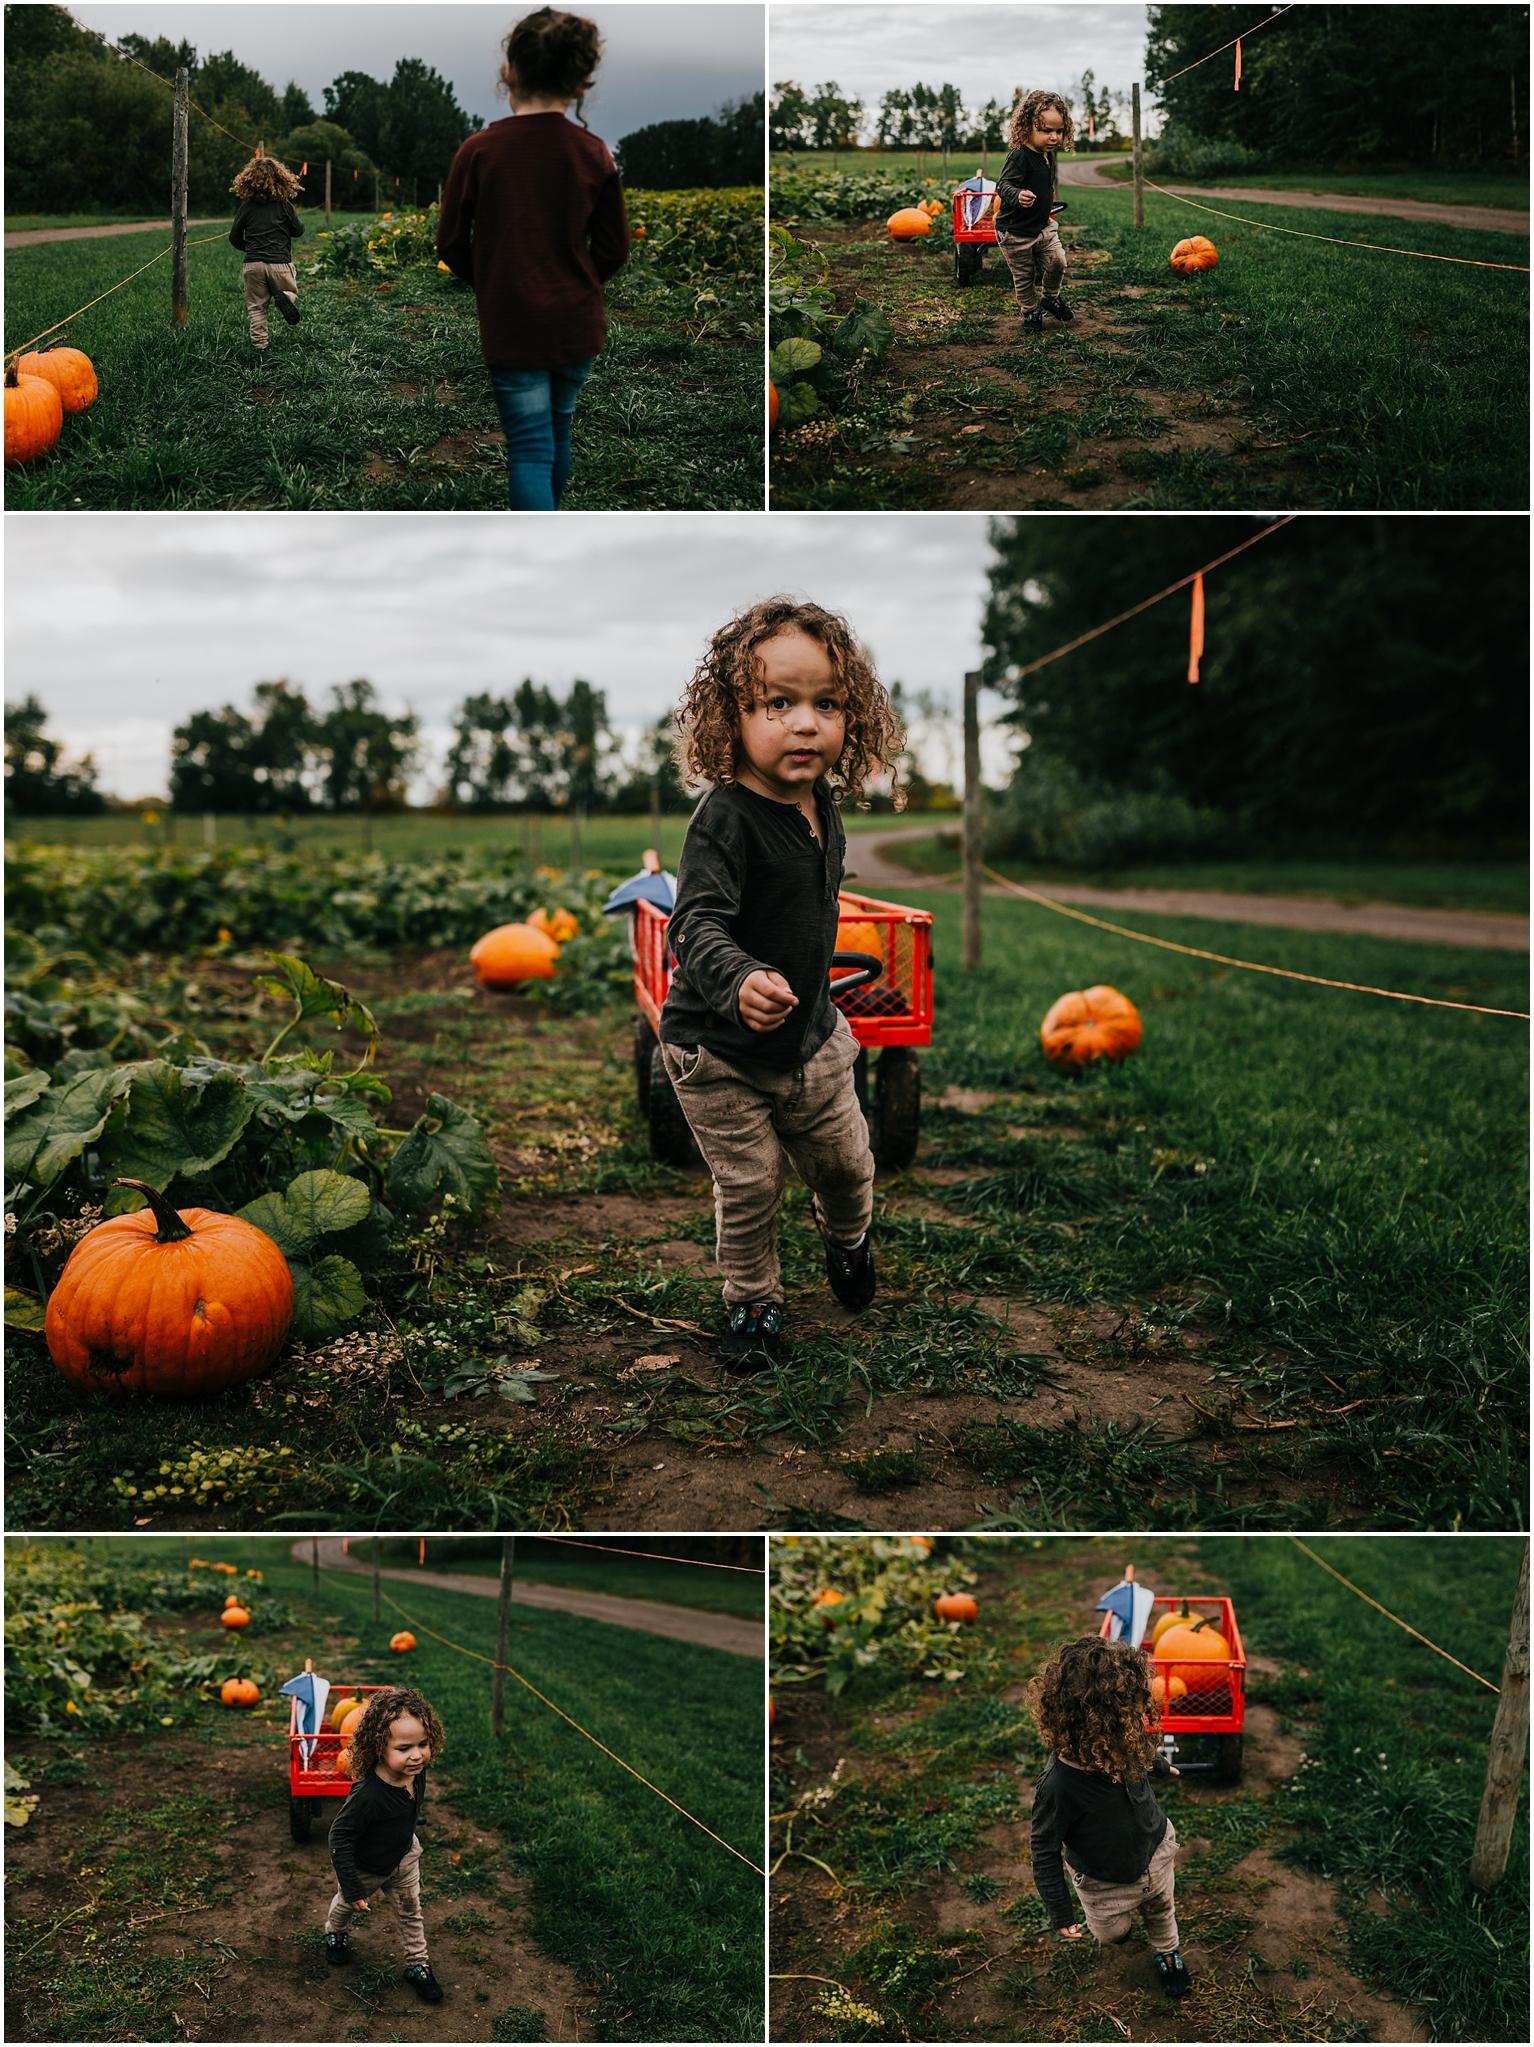 Edmonton Photographer - Treelines Photography - Somerset Farms U-Pick - Pumpkin Patch